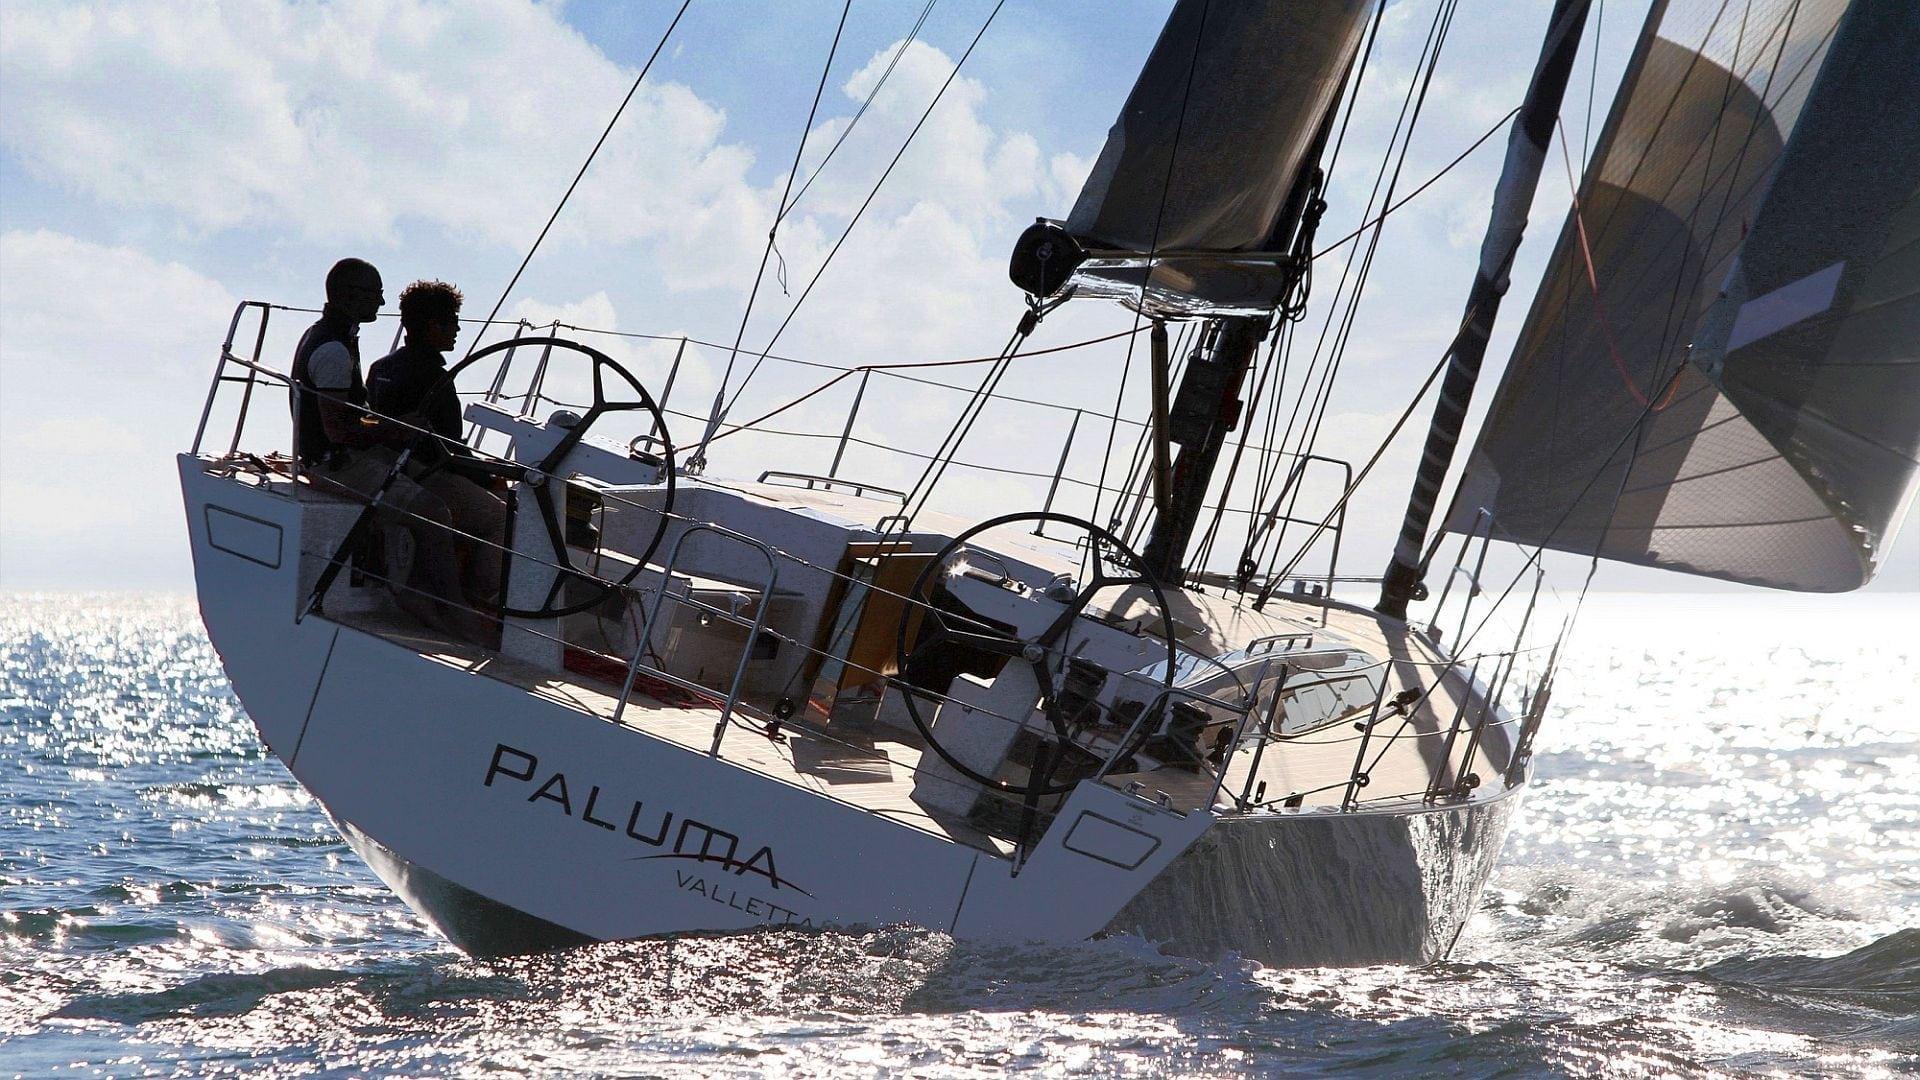 Solaris47 Fastsailing Greece Charter